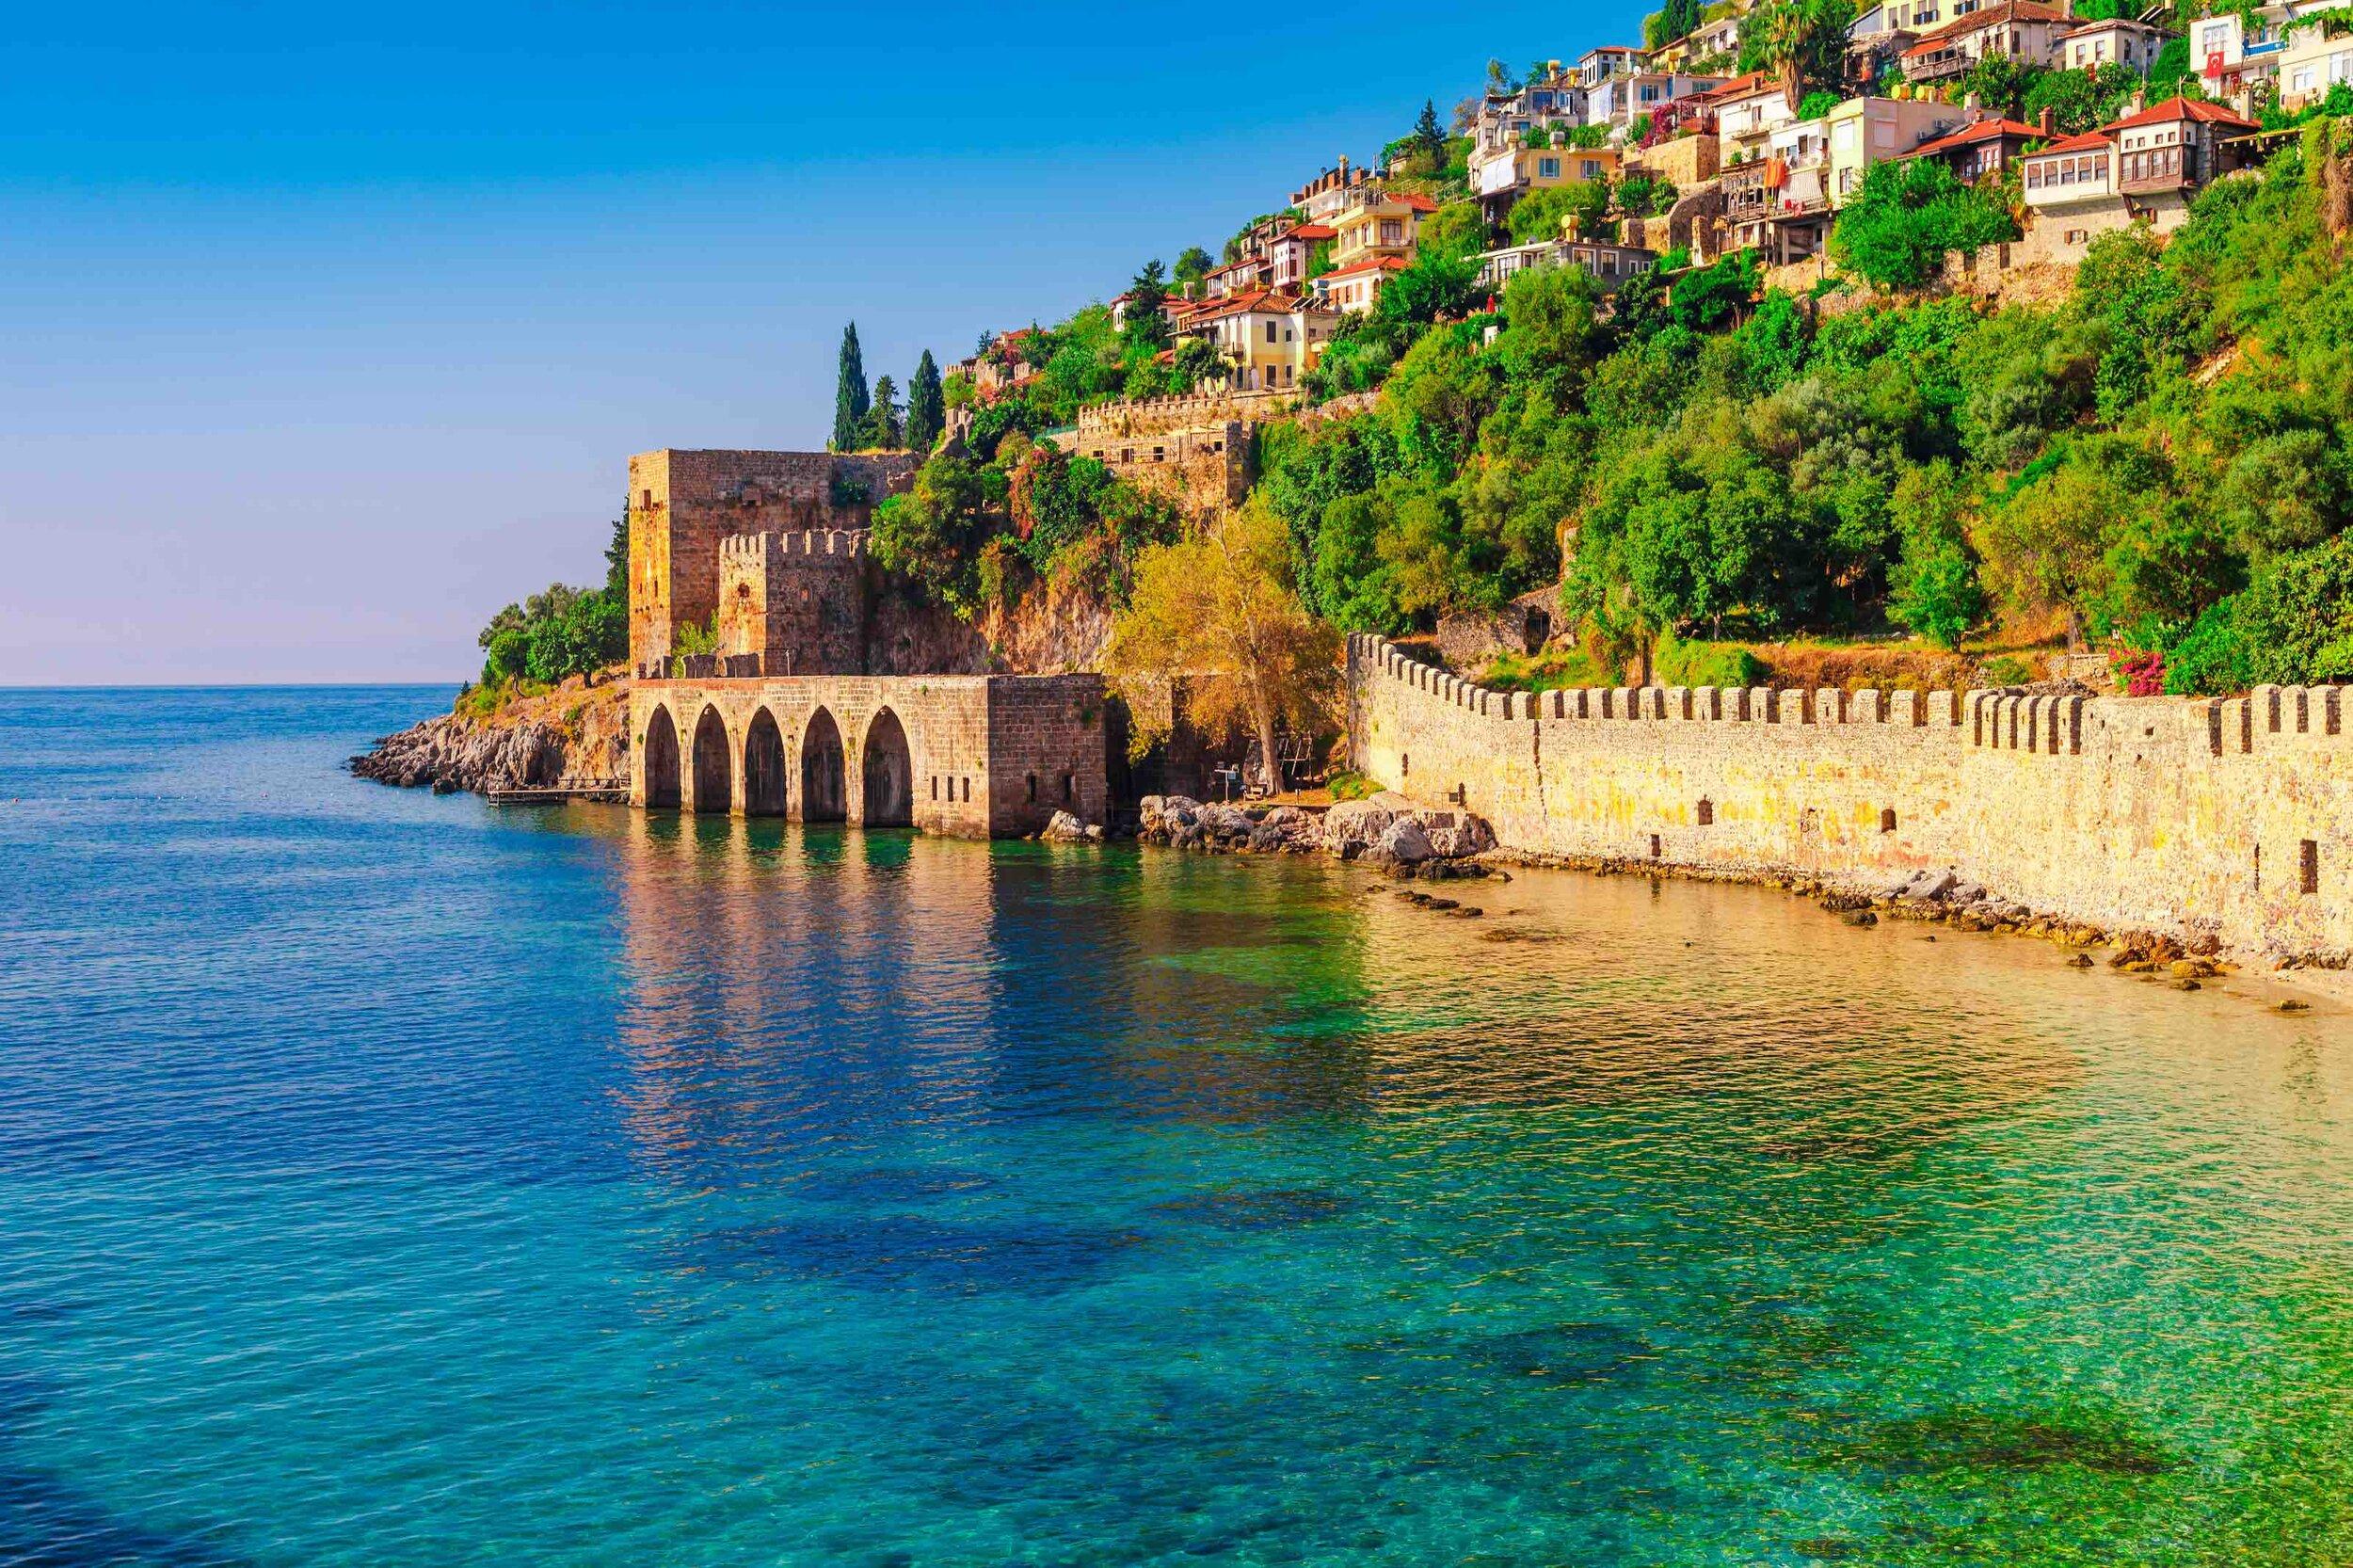 iStock-681983342 Turkish Coast with castle.jpg